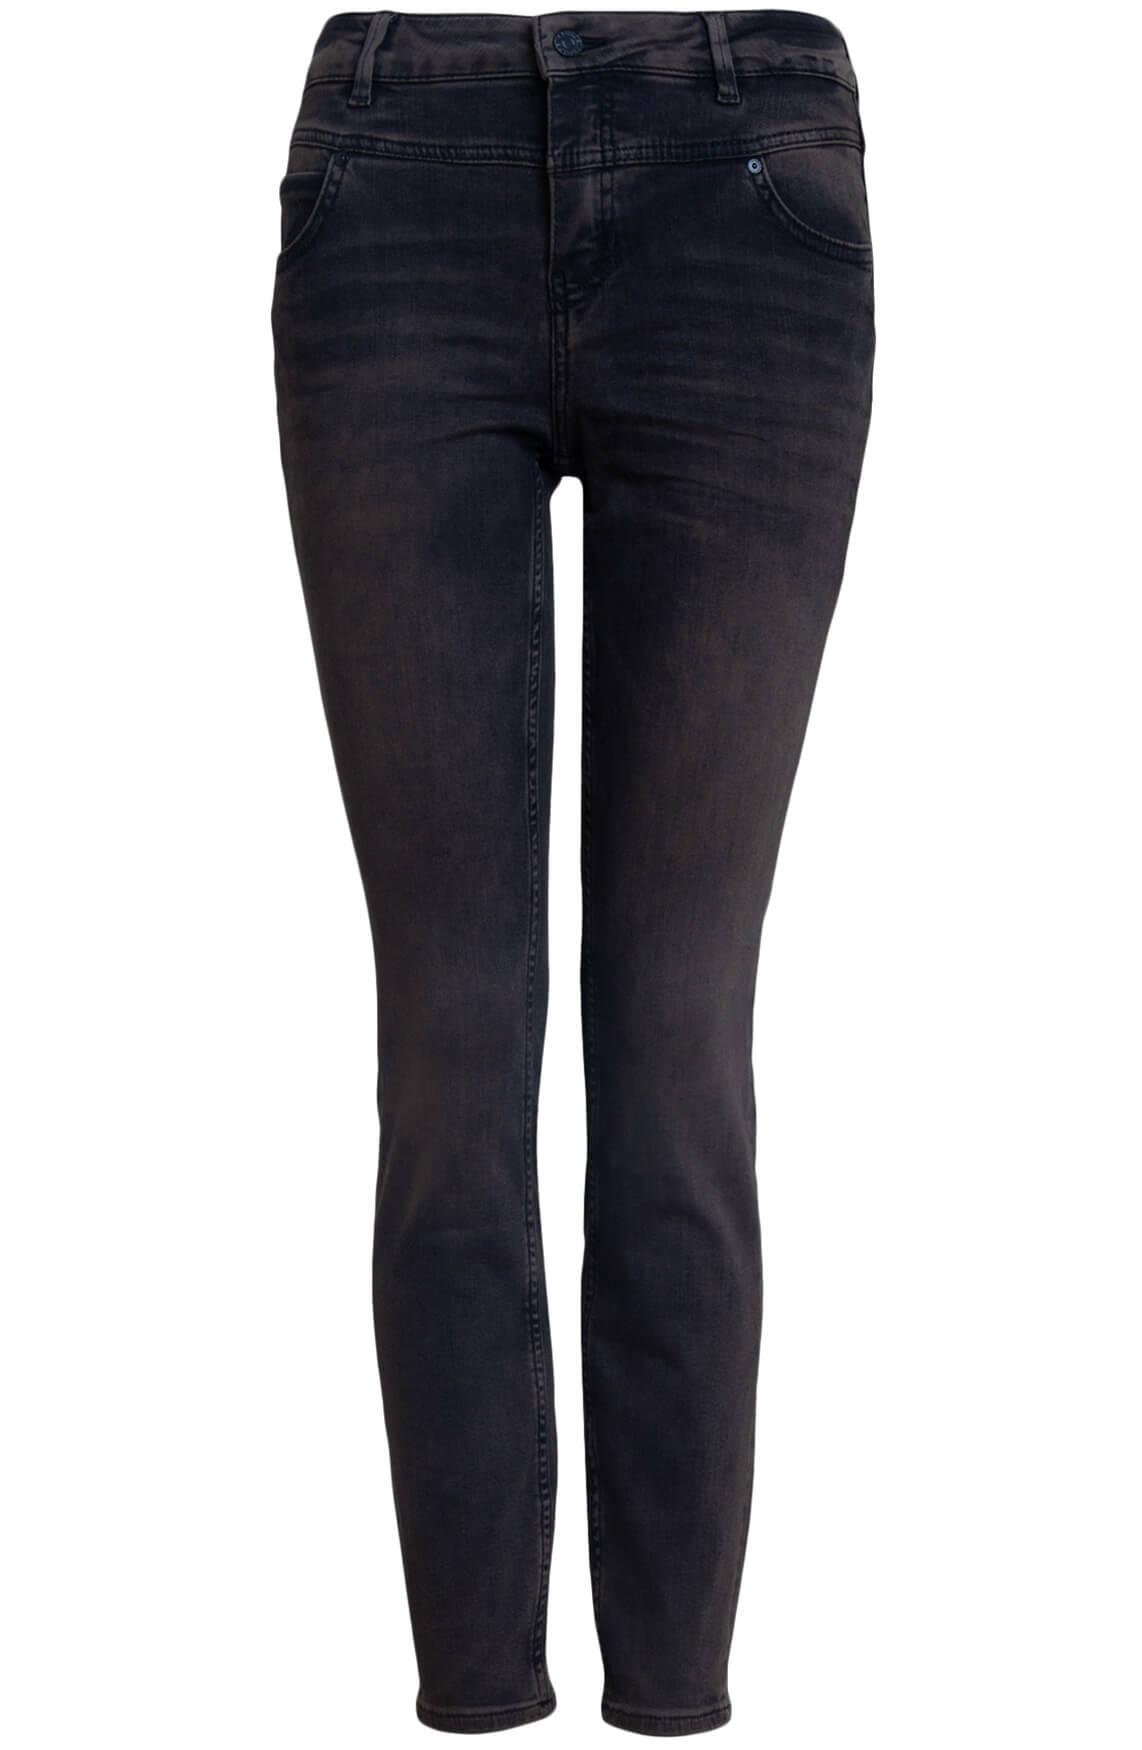 Rosner Dames L30 Antonia skinny jeans Bruin